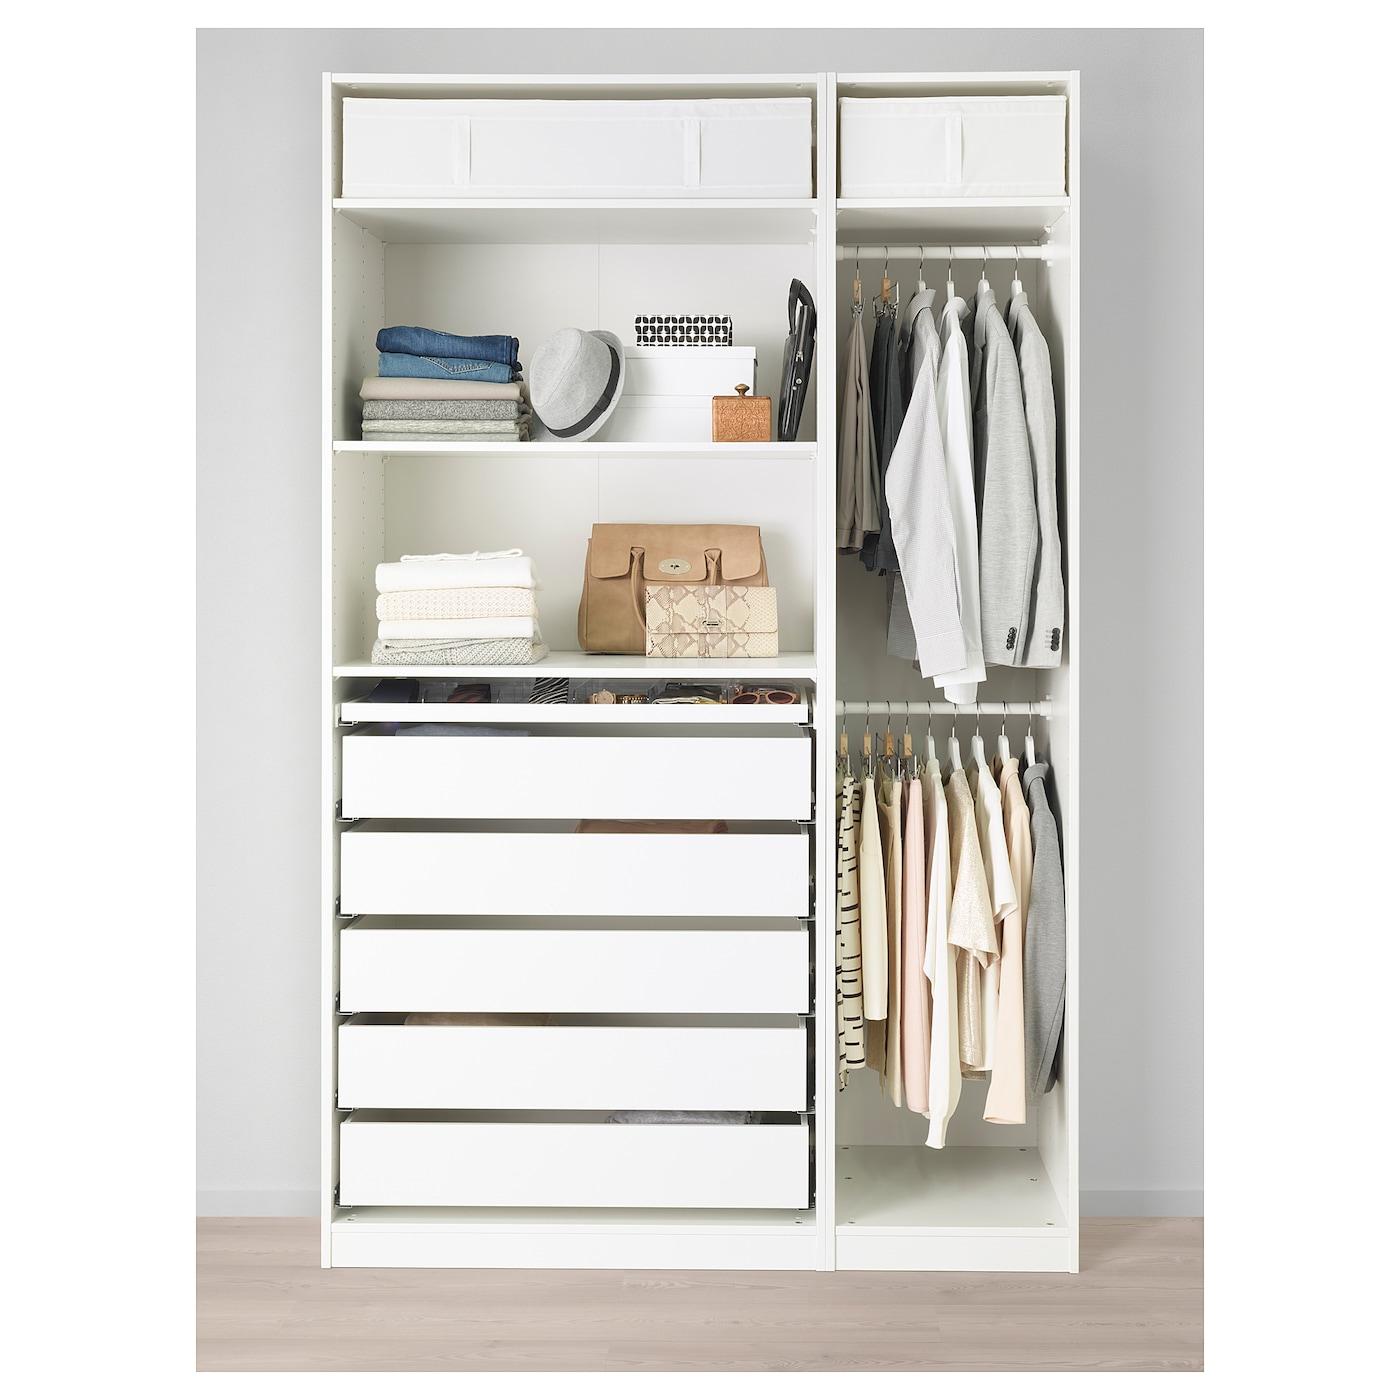 pax kledingkast wit 150 x 58 x 236 cm ikea. Black Bedroom Furniture Sets. Home Design Ideas